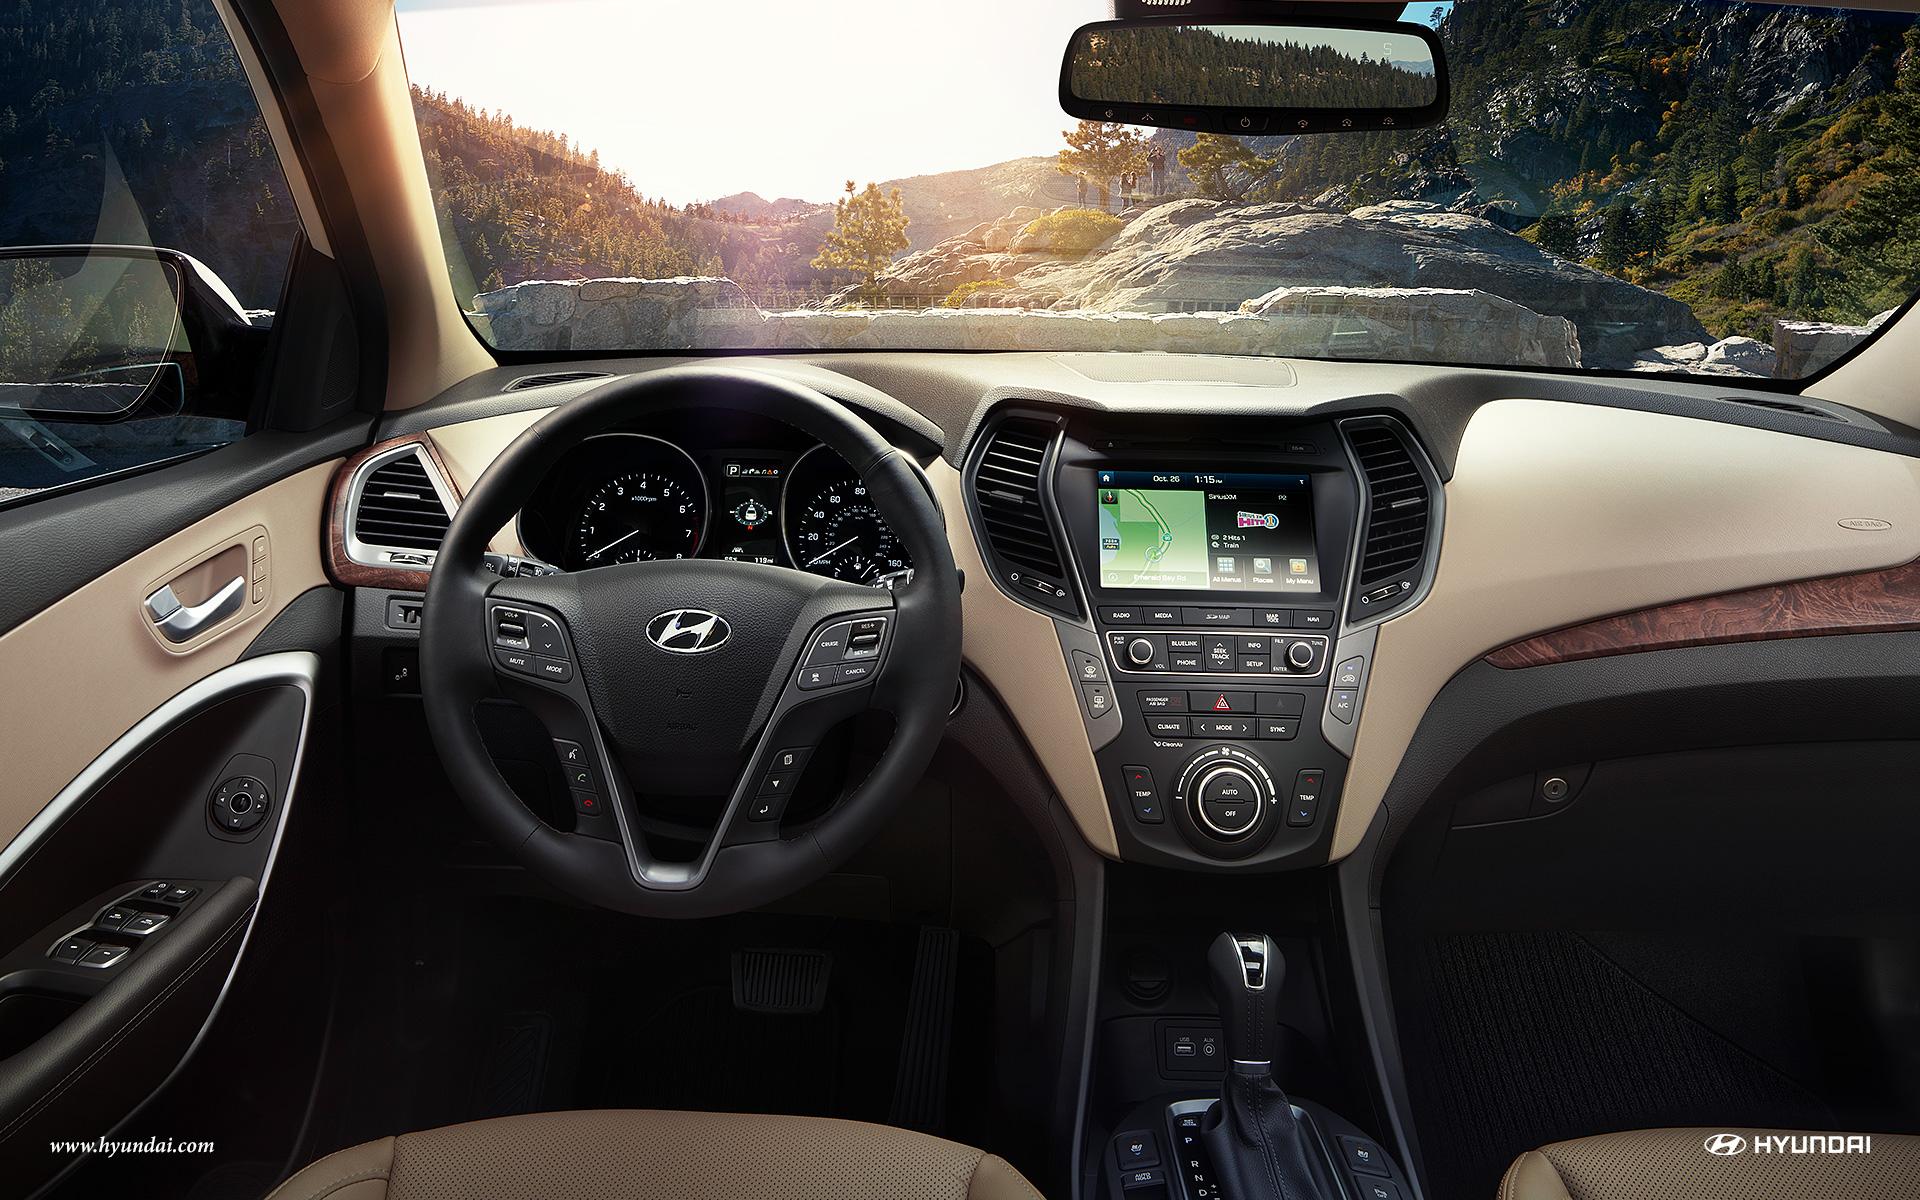 2018 Hyundai Santa Fe Sport Leasing near Laurel MD Pohanka